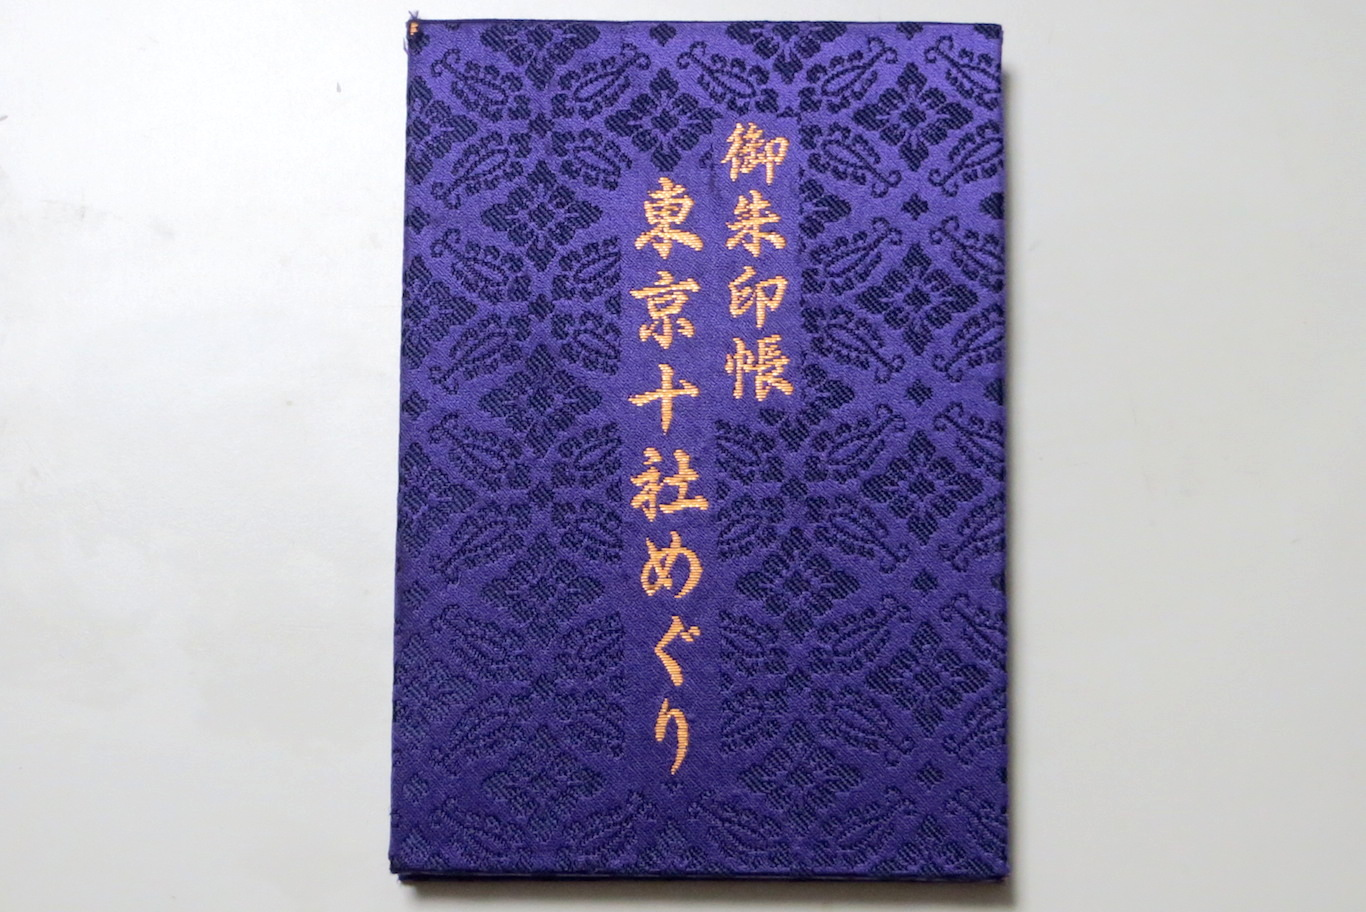 東京十社巡り御朱印帳